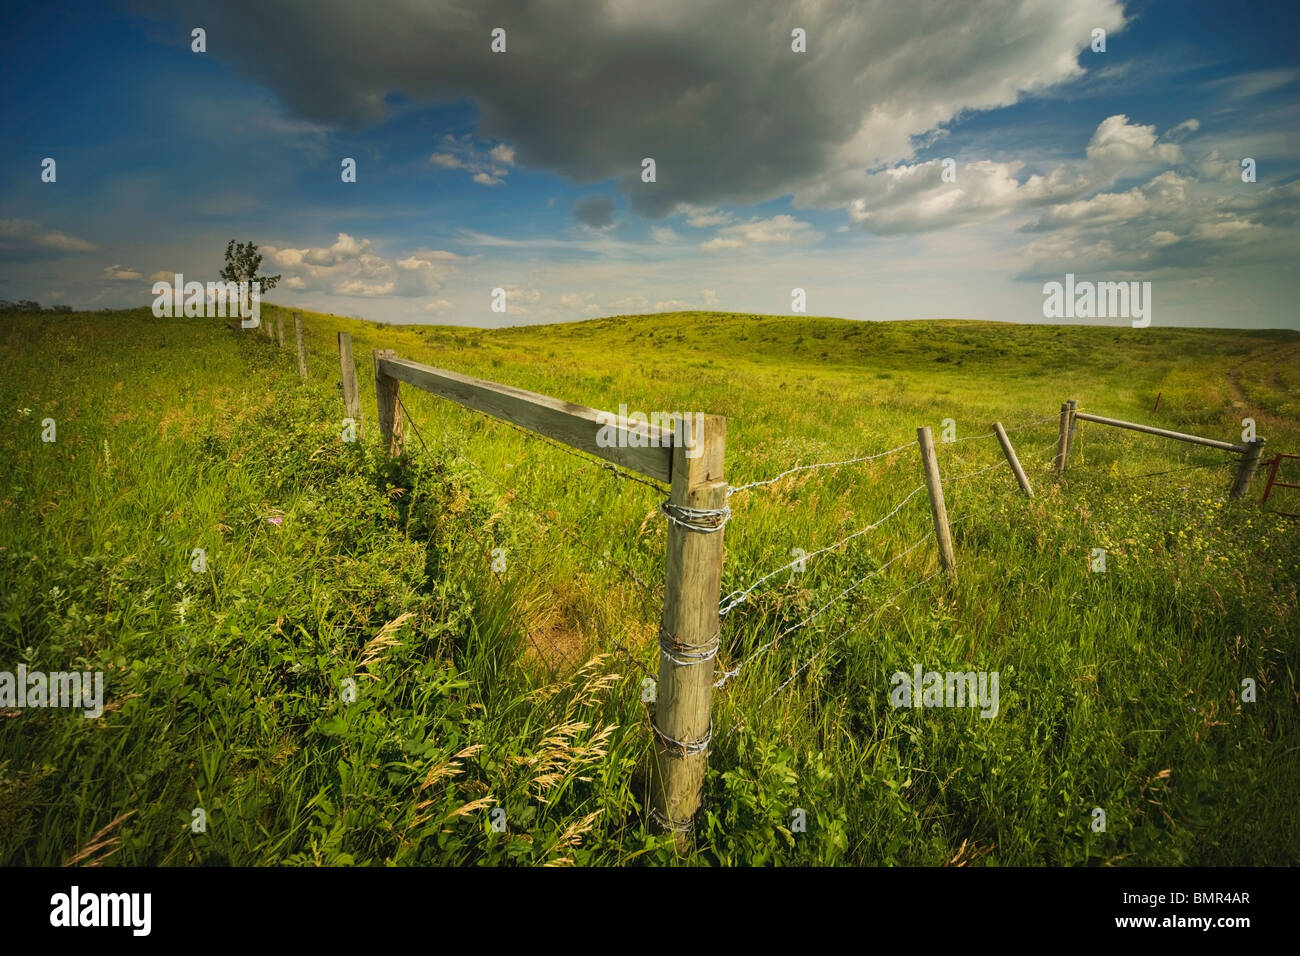 Morecambe, Alberta, Kanada; Ein Zaun In einem Feld Stockbild